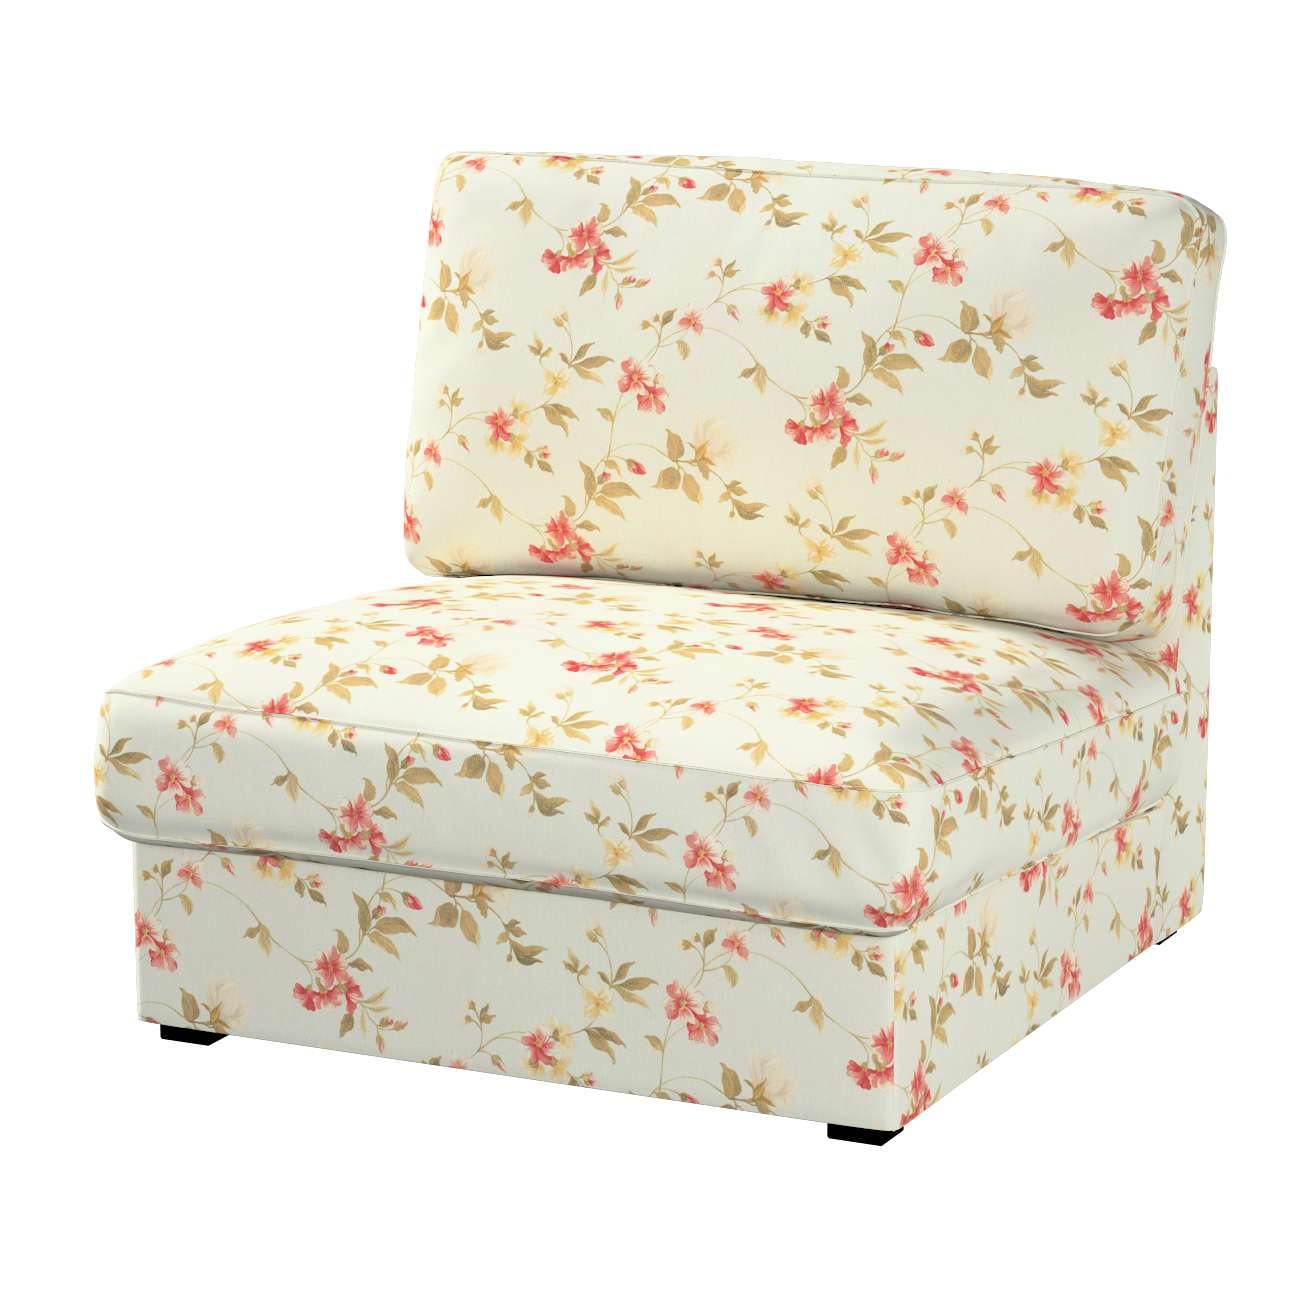 Pokrowiec na fotel Kivik Fotel Kivik w kolekcji Londres, tkanina: 124-65